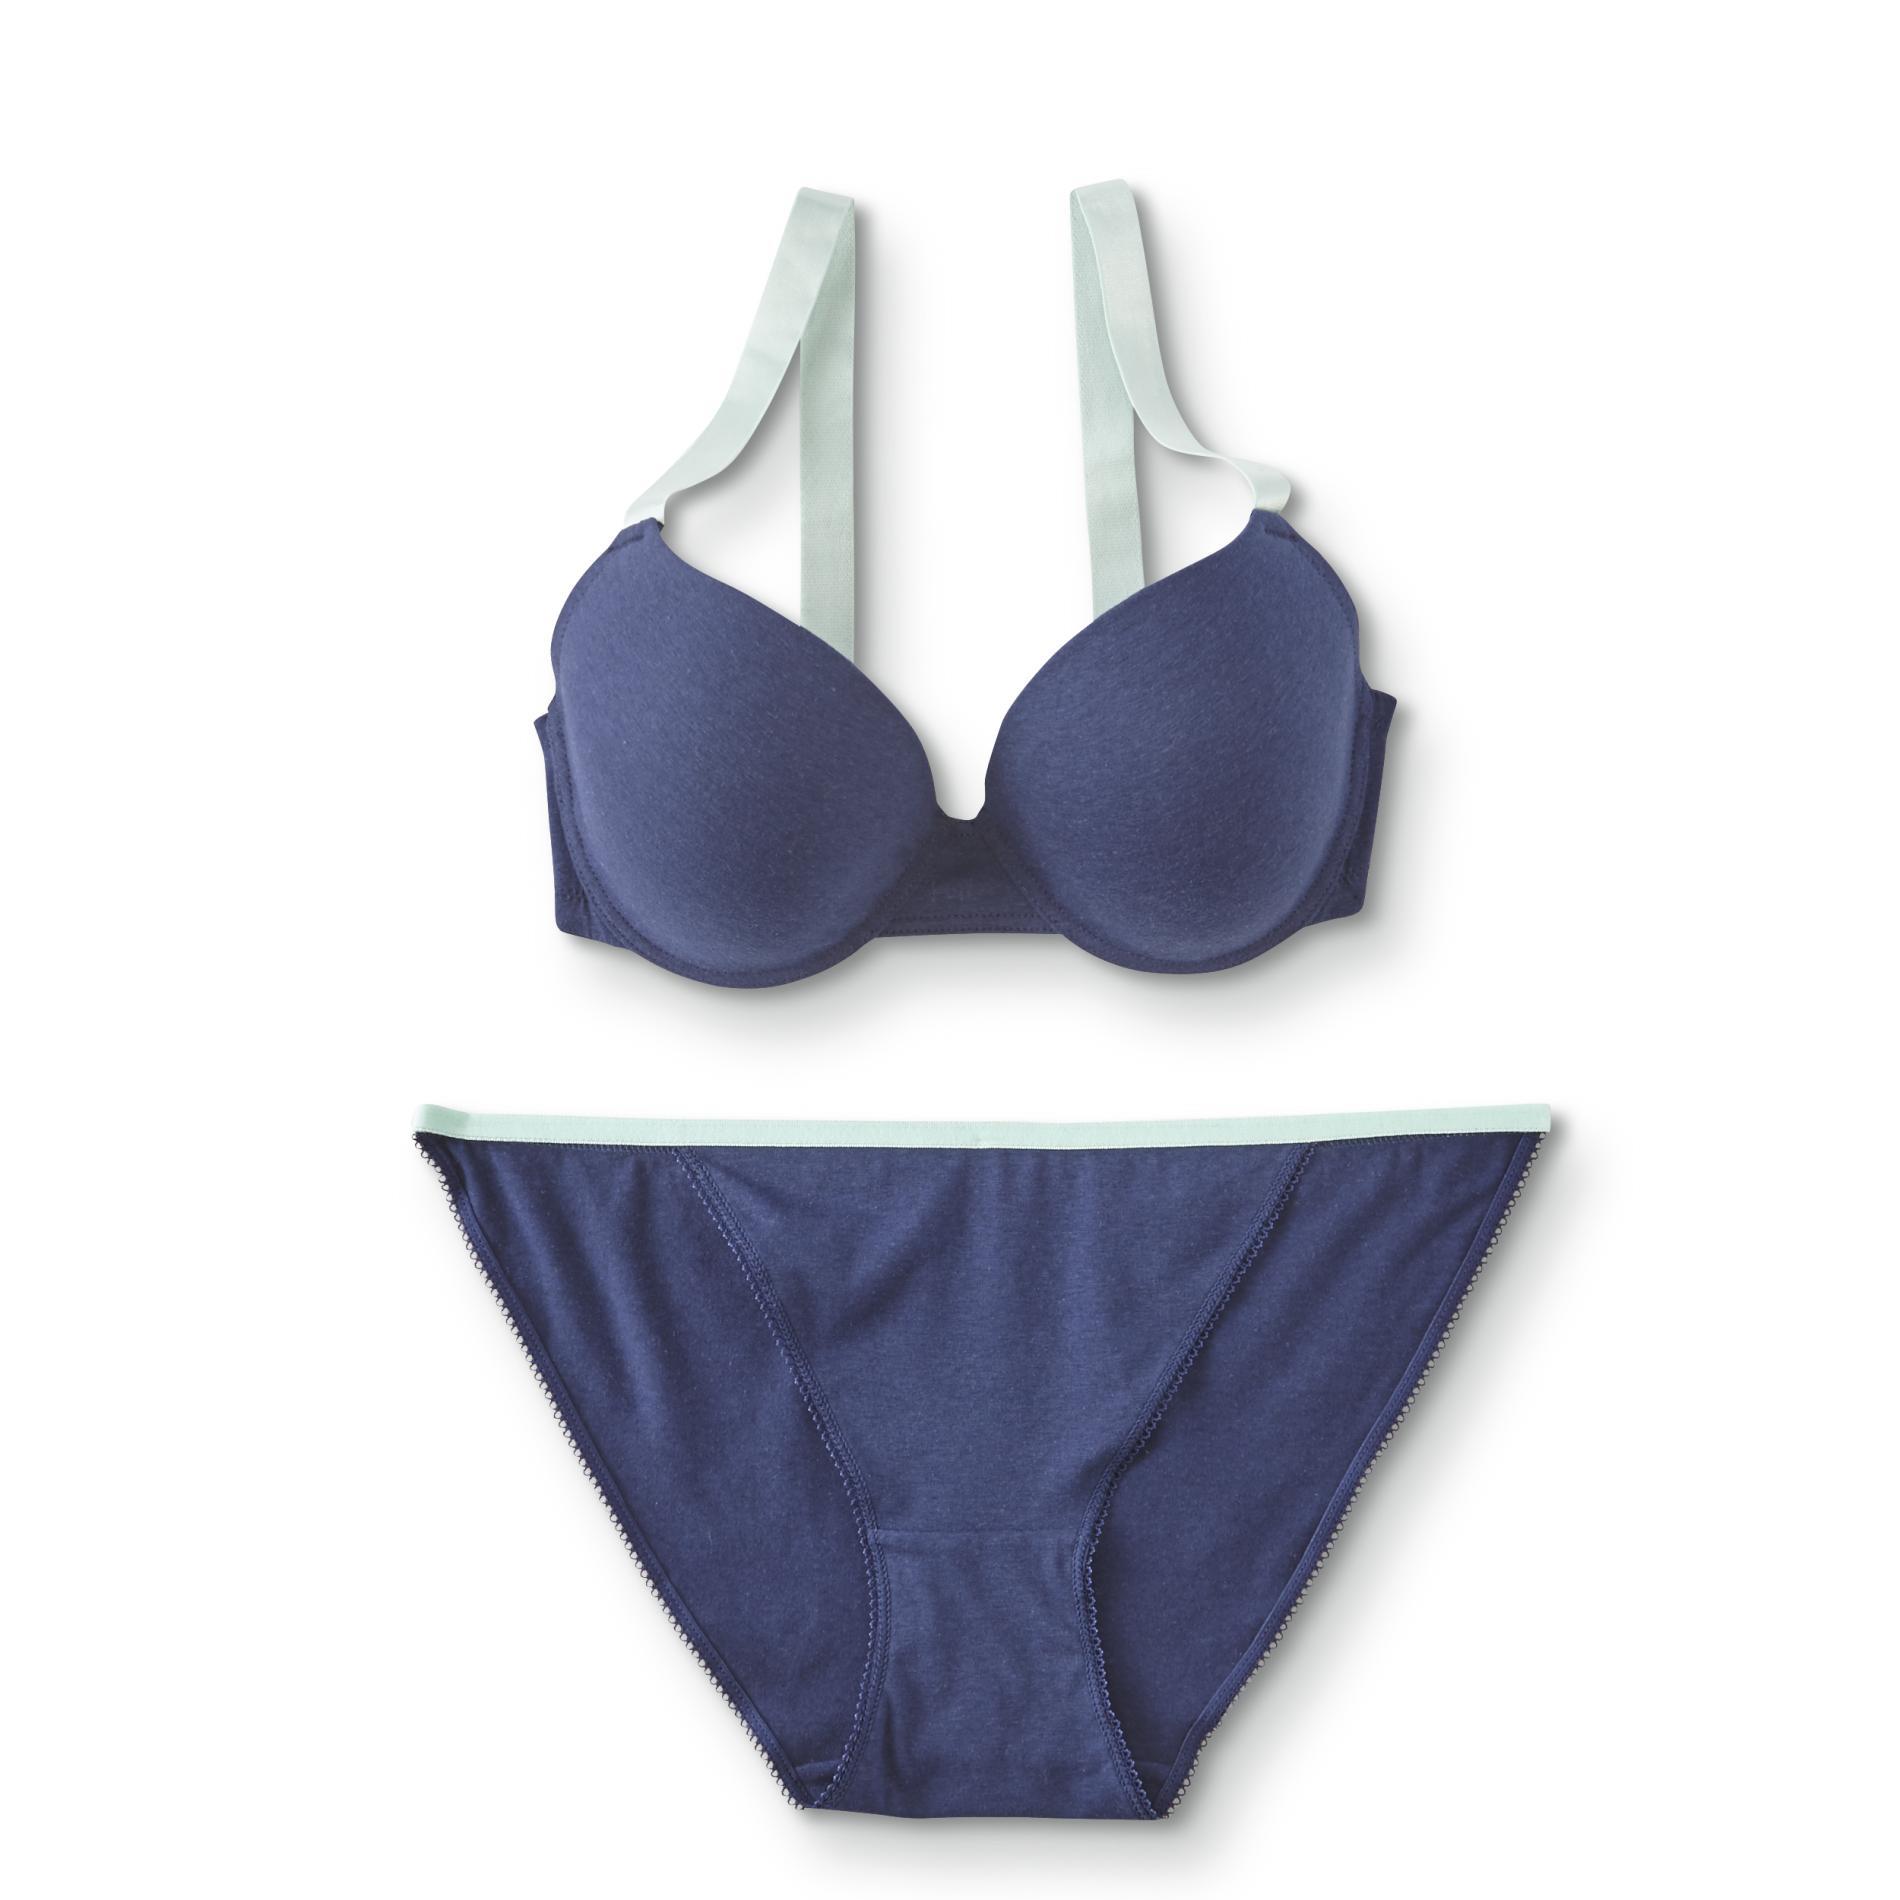 Image of Women's Full-Figure Push-Up Bra & String Bikini Panties, Size: 40, Medieval Blue